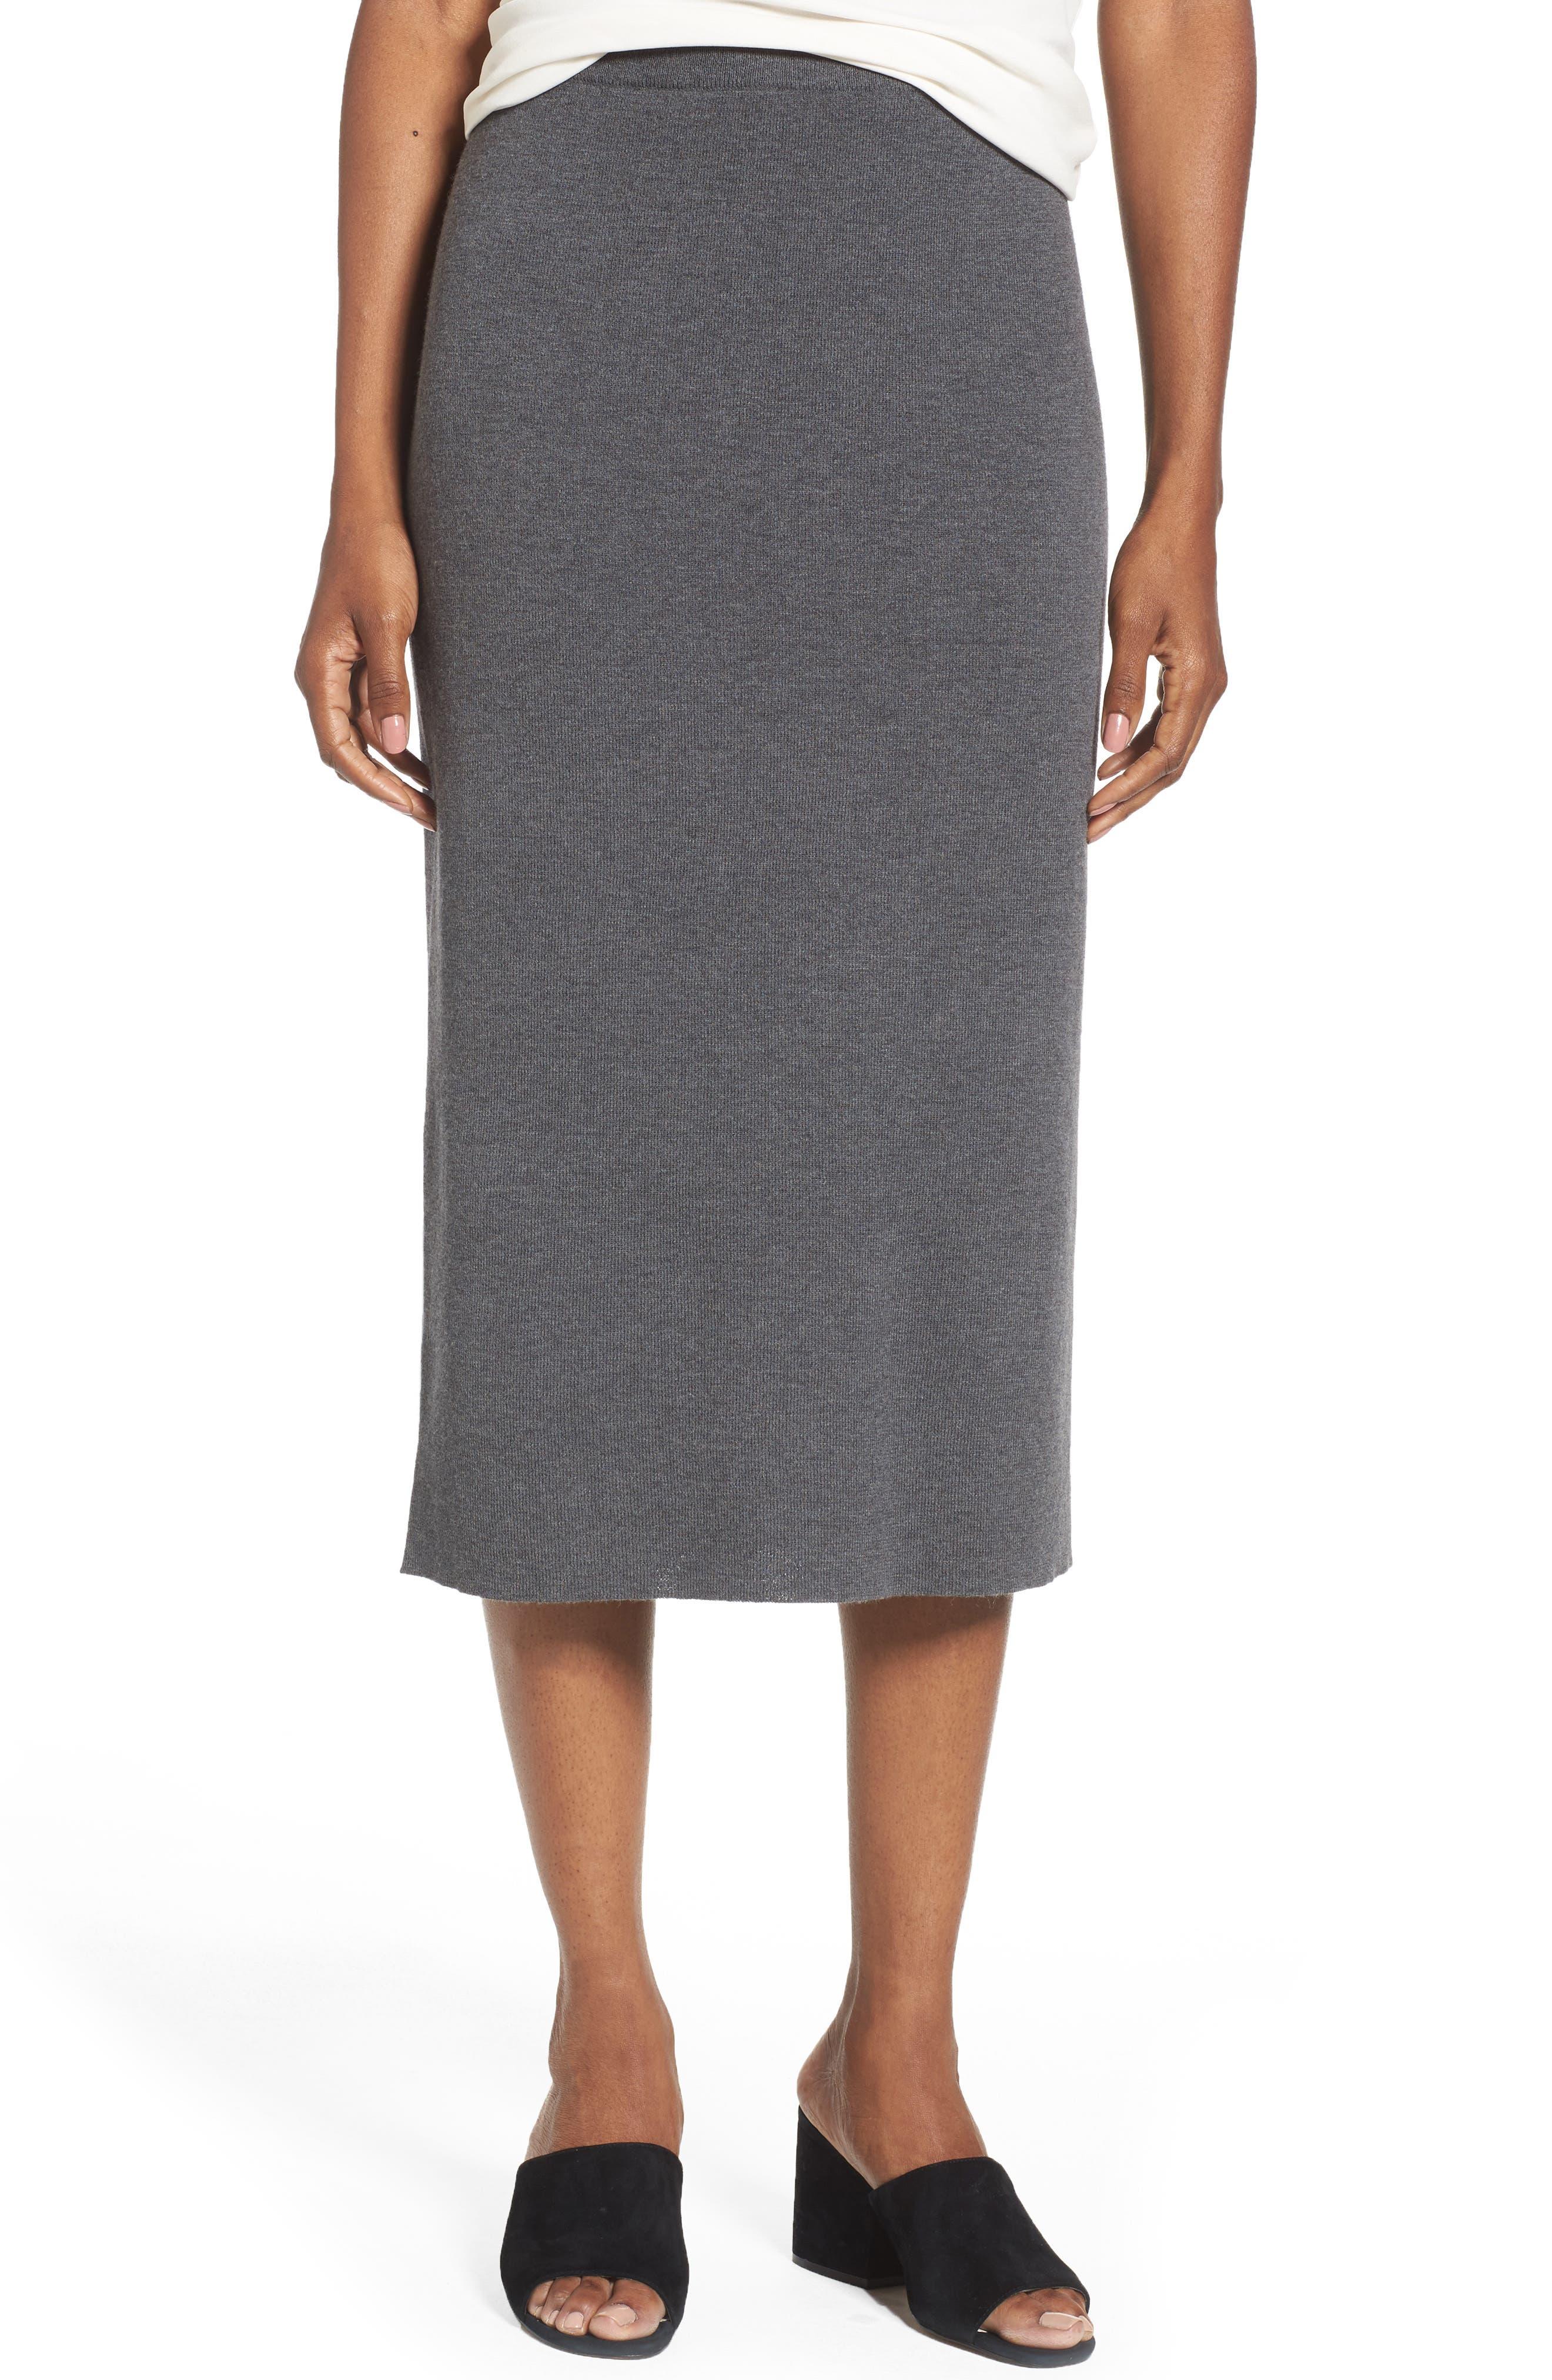 Eileen Fisher Wool Knit Pencil Skirt